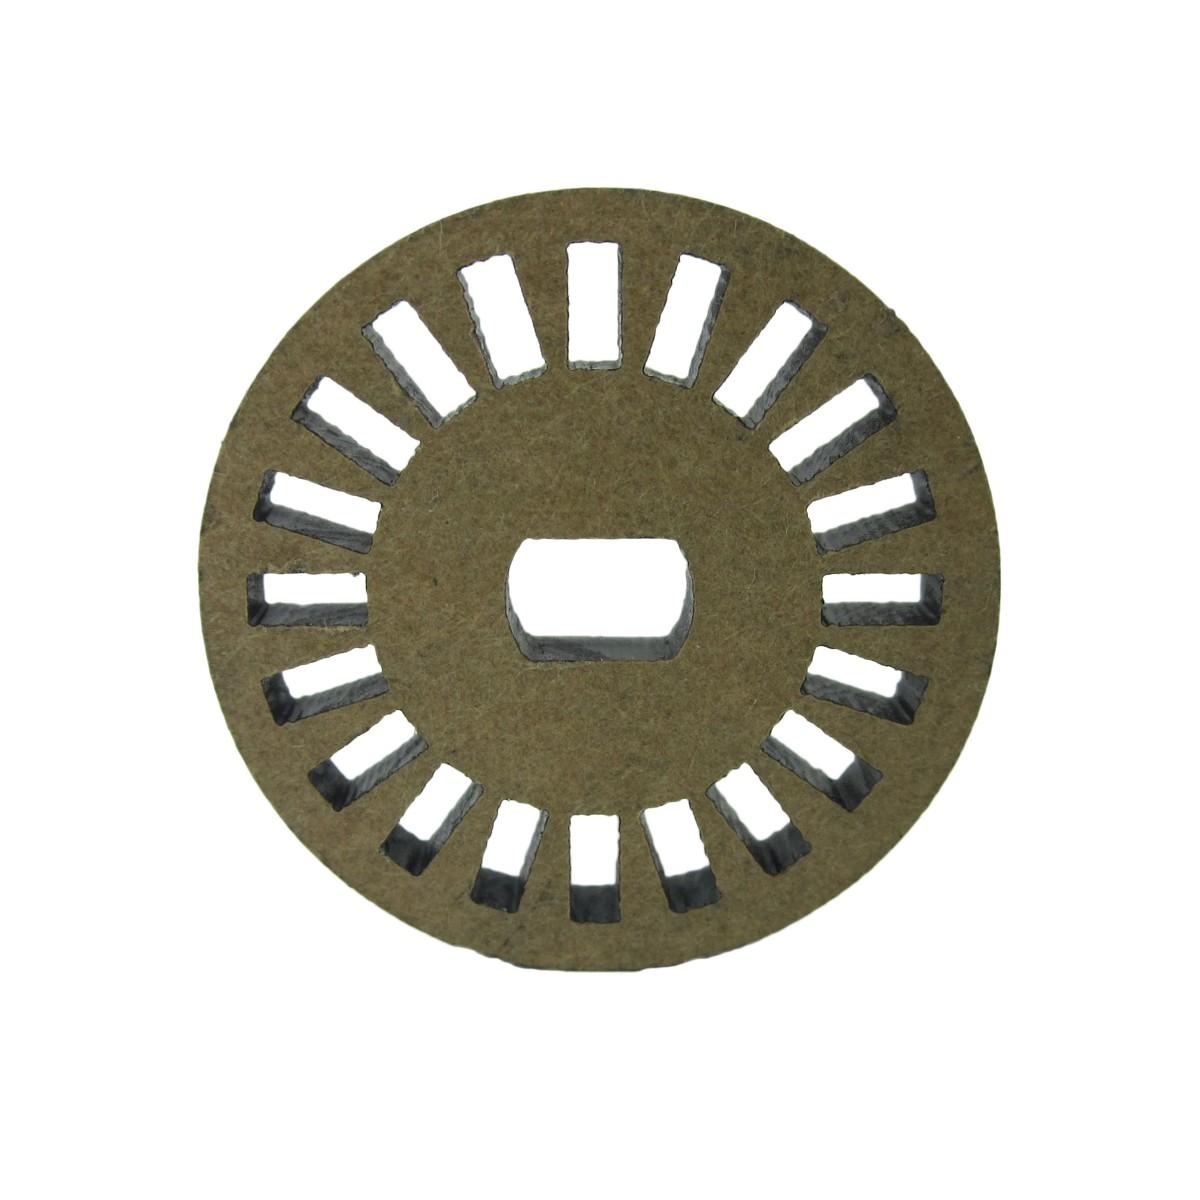 TT馬達輪子專用 測速碼盤模組 20柵格測速碼盤